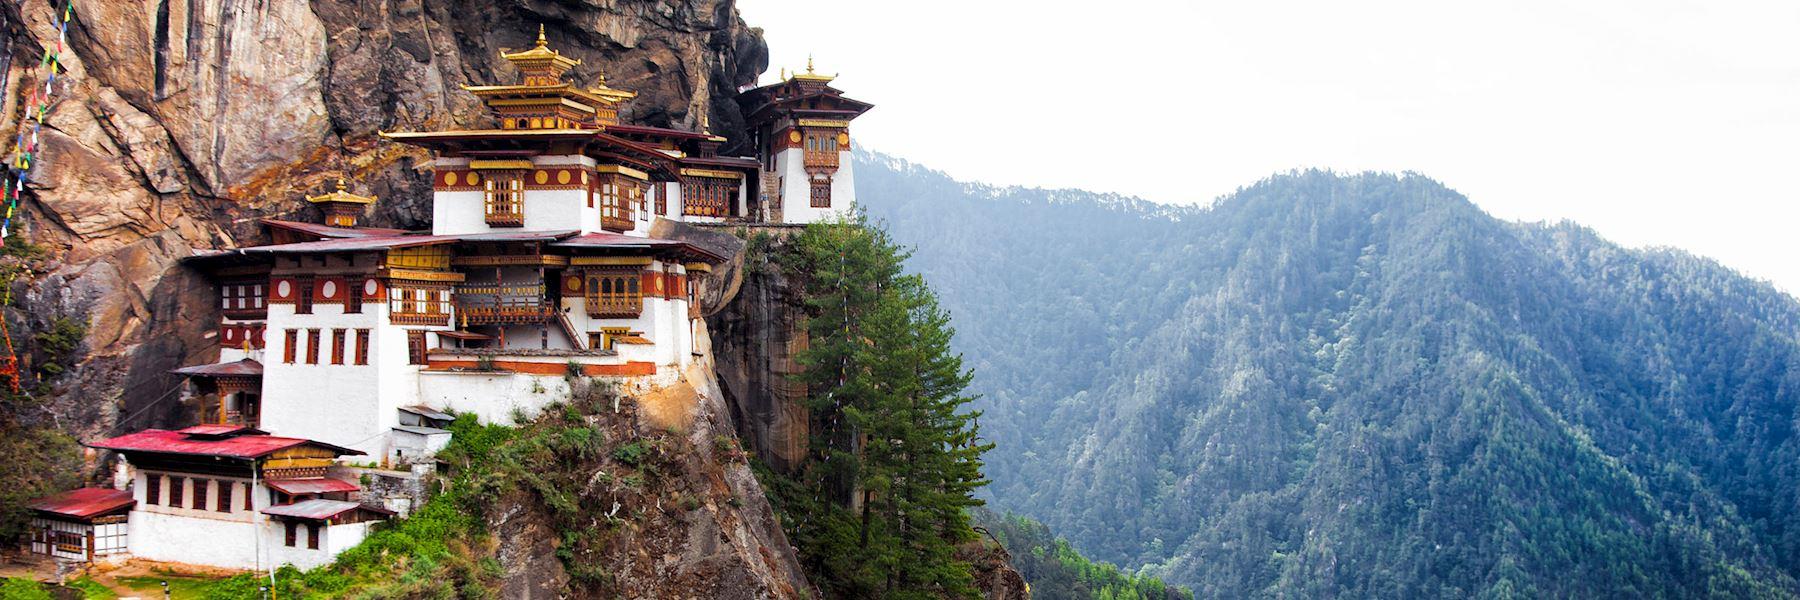 Bhutan vacations